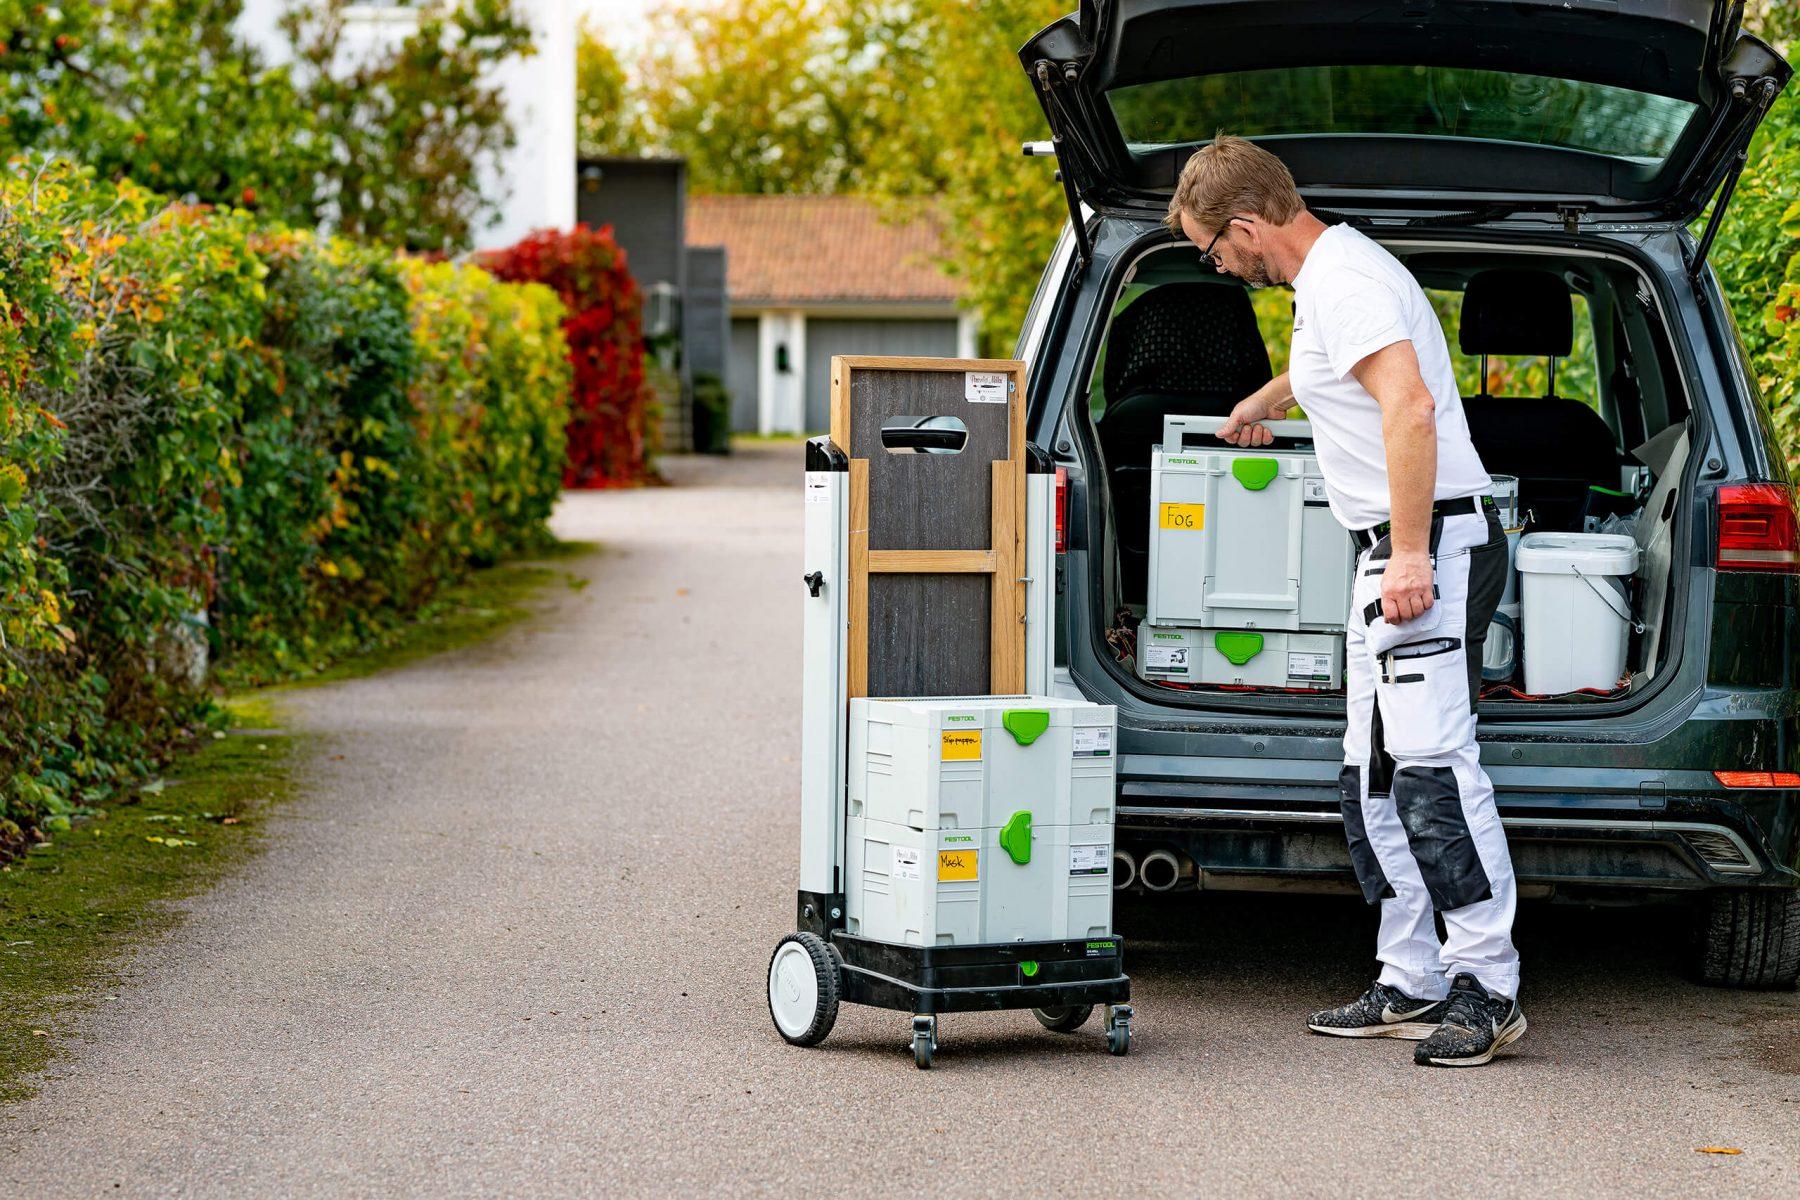 Unloading car with Festool gear